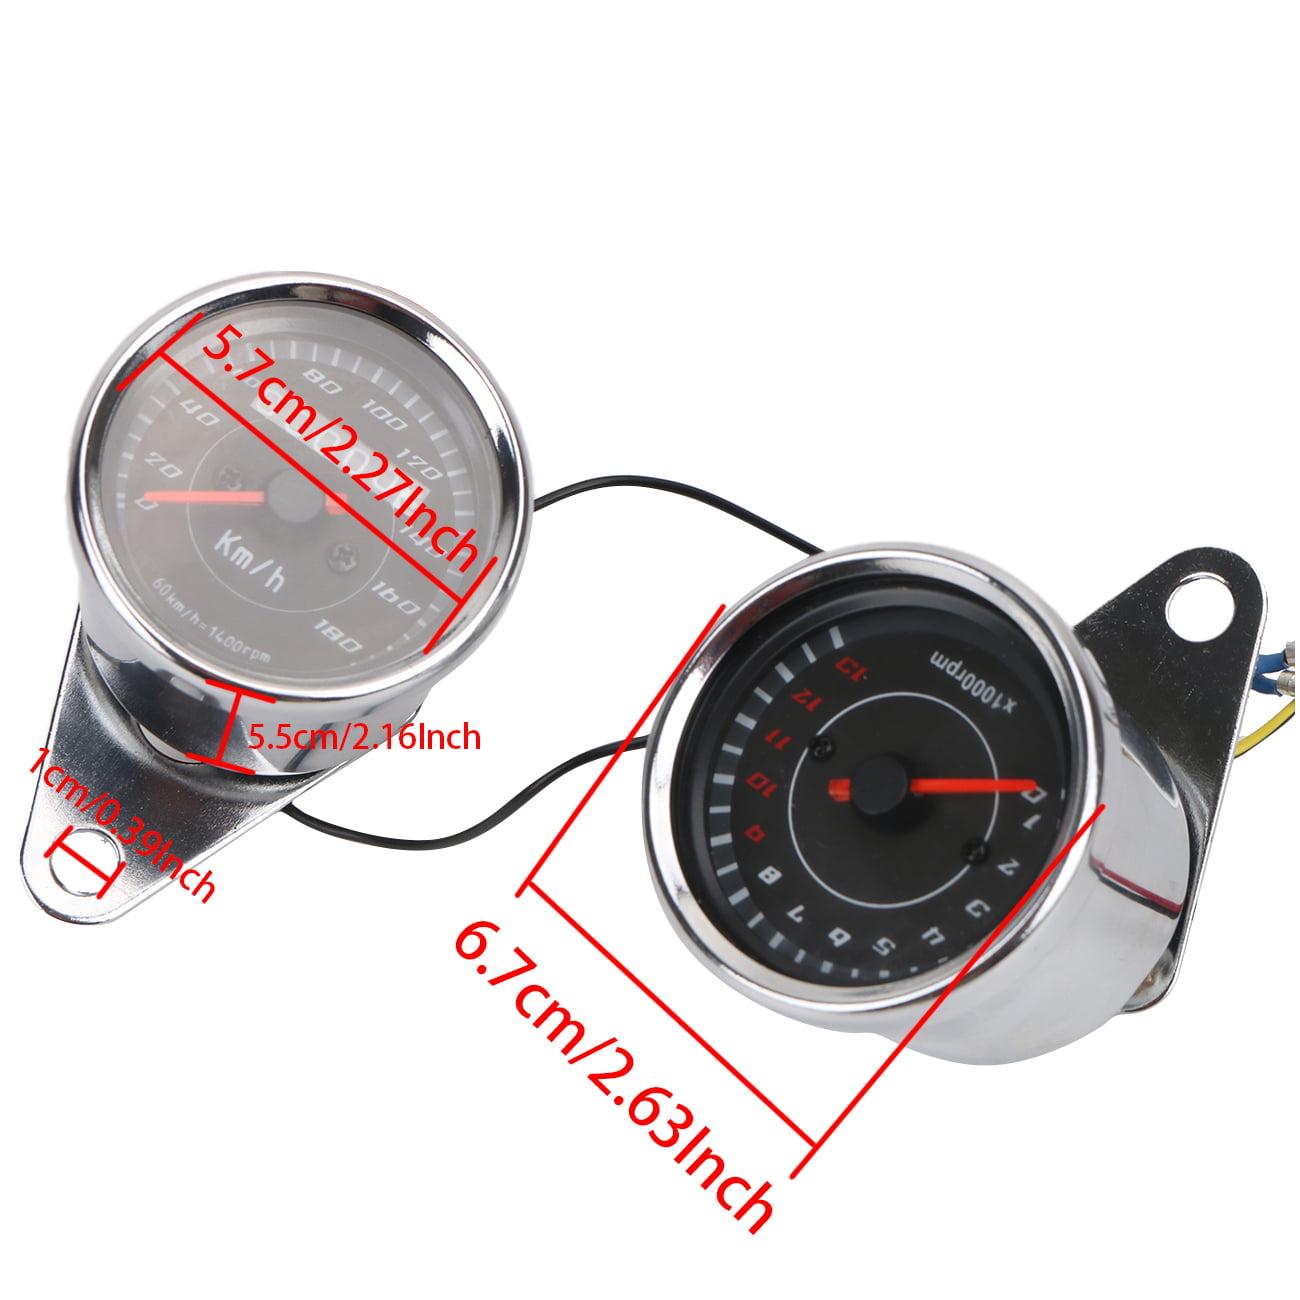 BuyInHouse Universal Motorcycle Odometer Speedometer Tach...